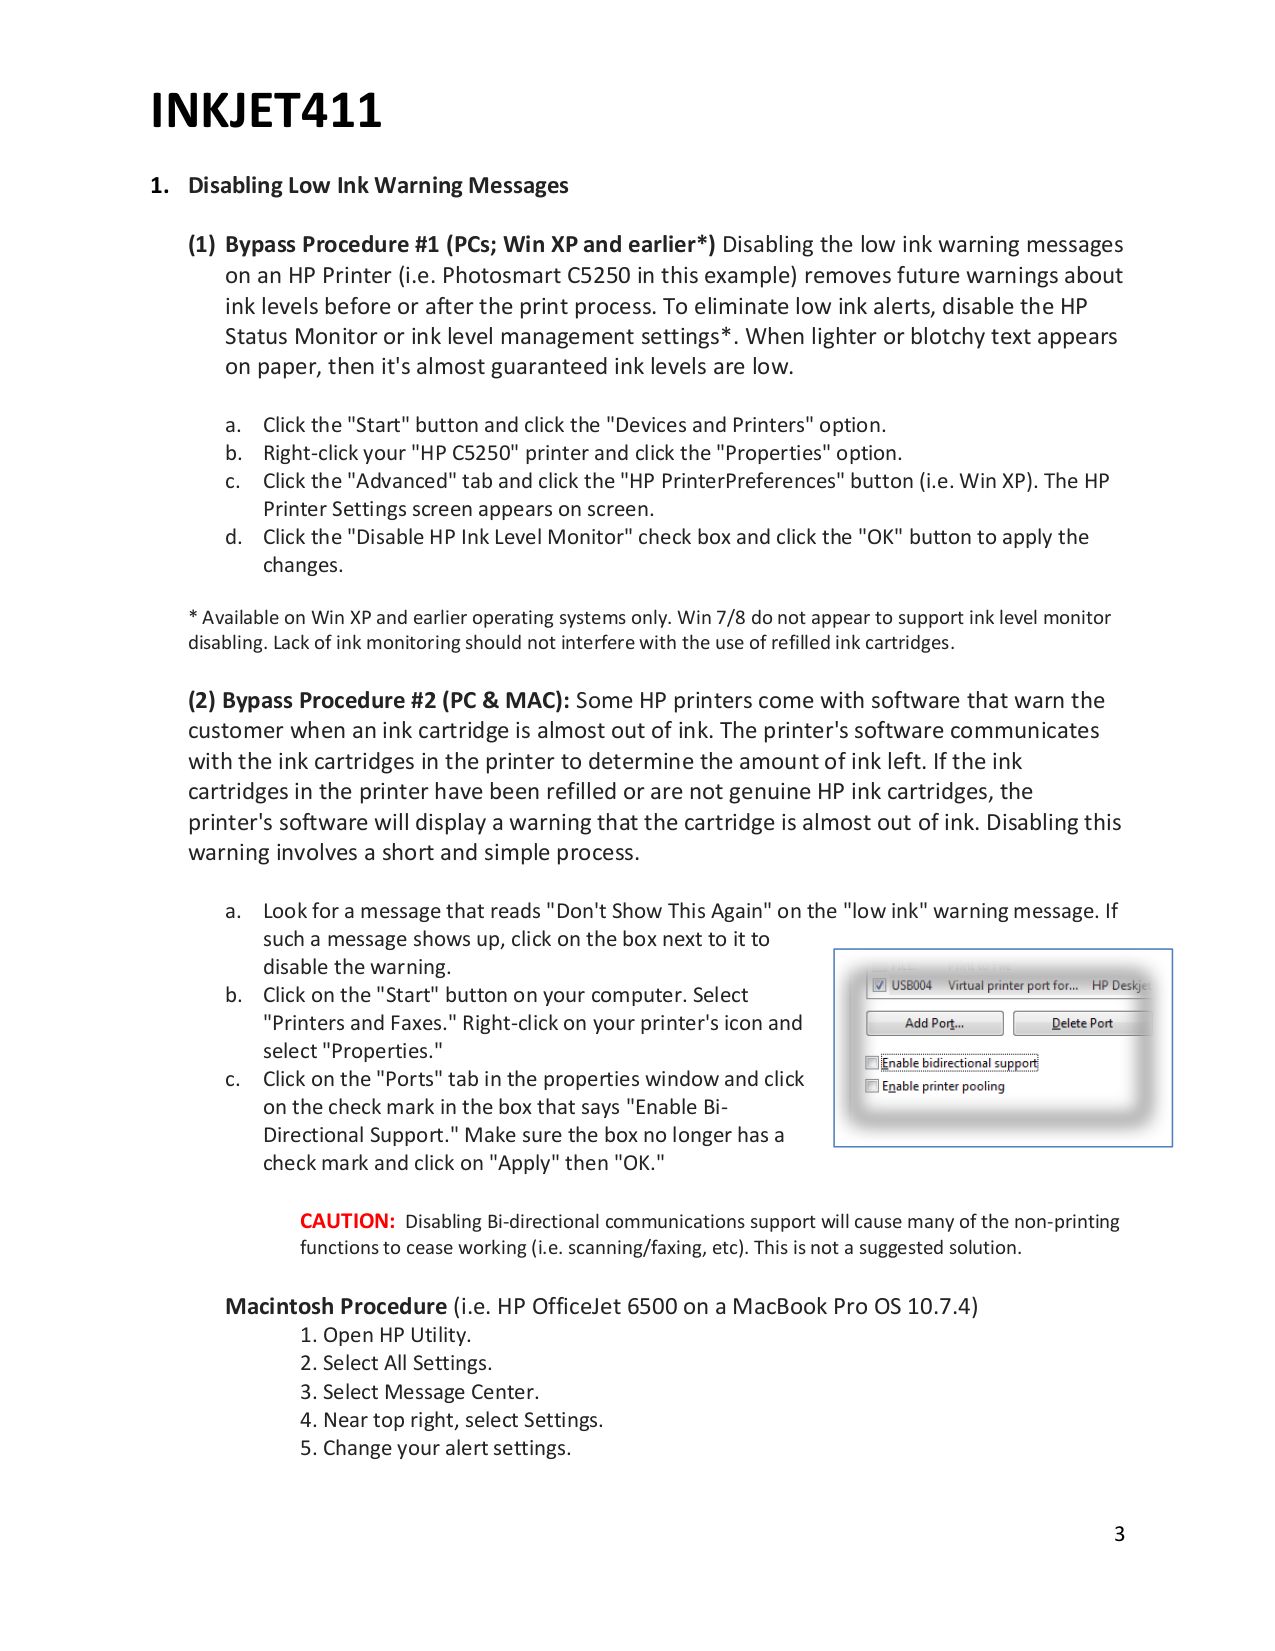 PDF manual for HP Printer Deskjet 5740